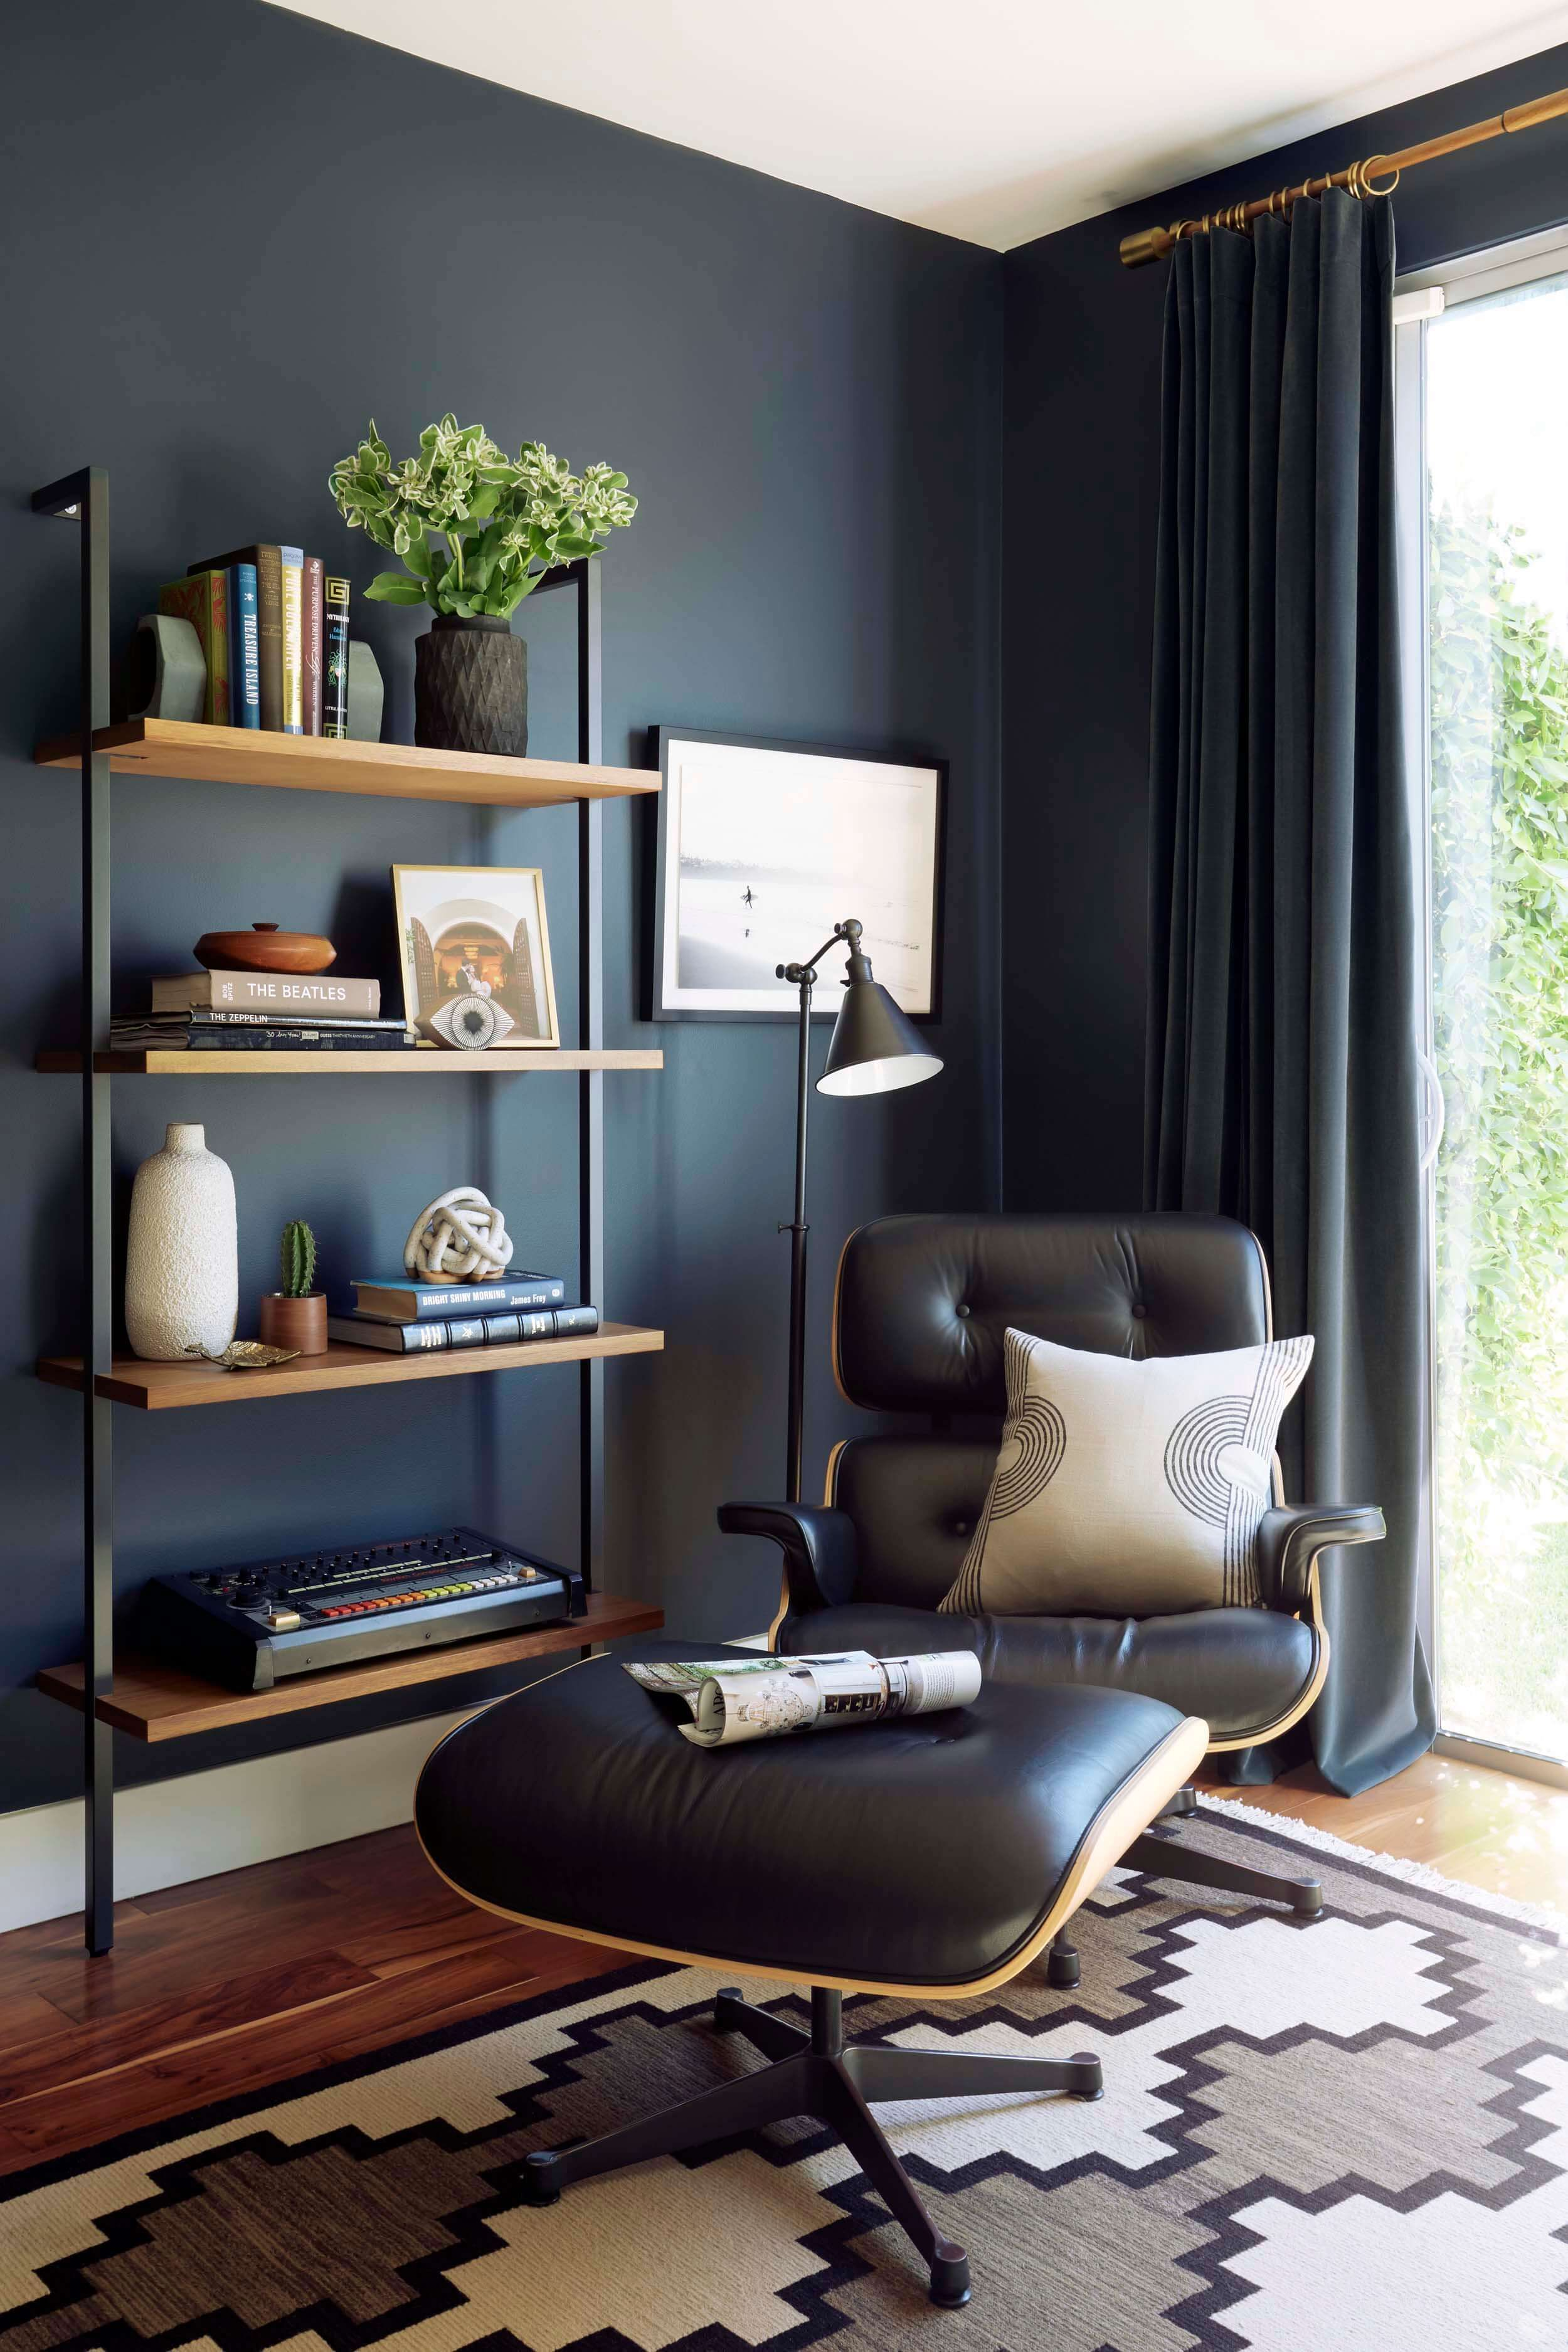 Arbeitszimmer farbgestaltung  Moody Mid Century Home Office | Farbgestaltung, Bruder und Arbeitszimmer